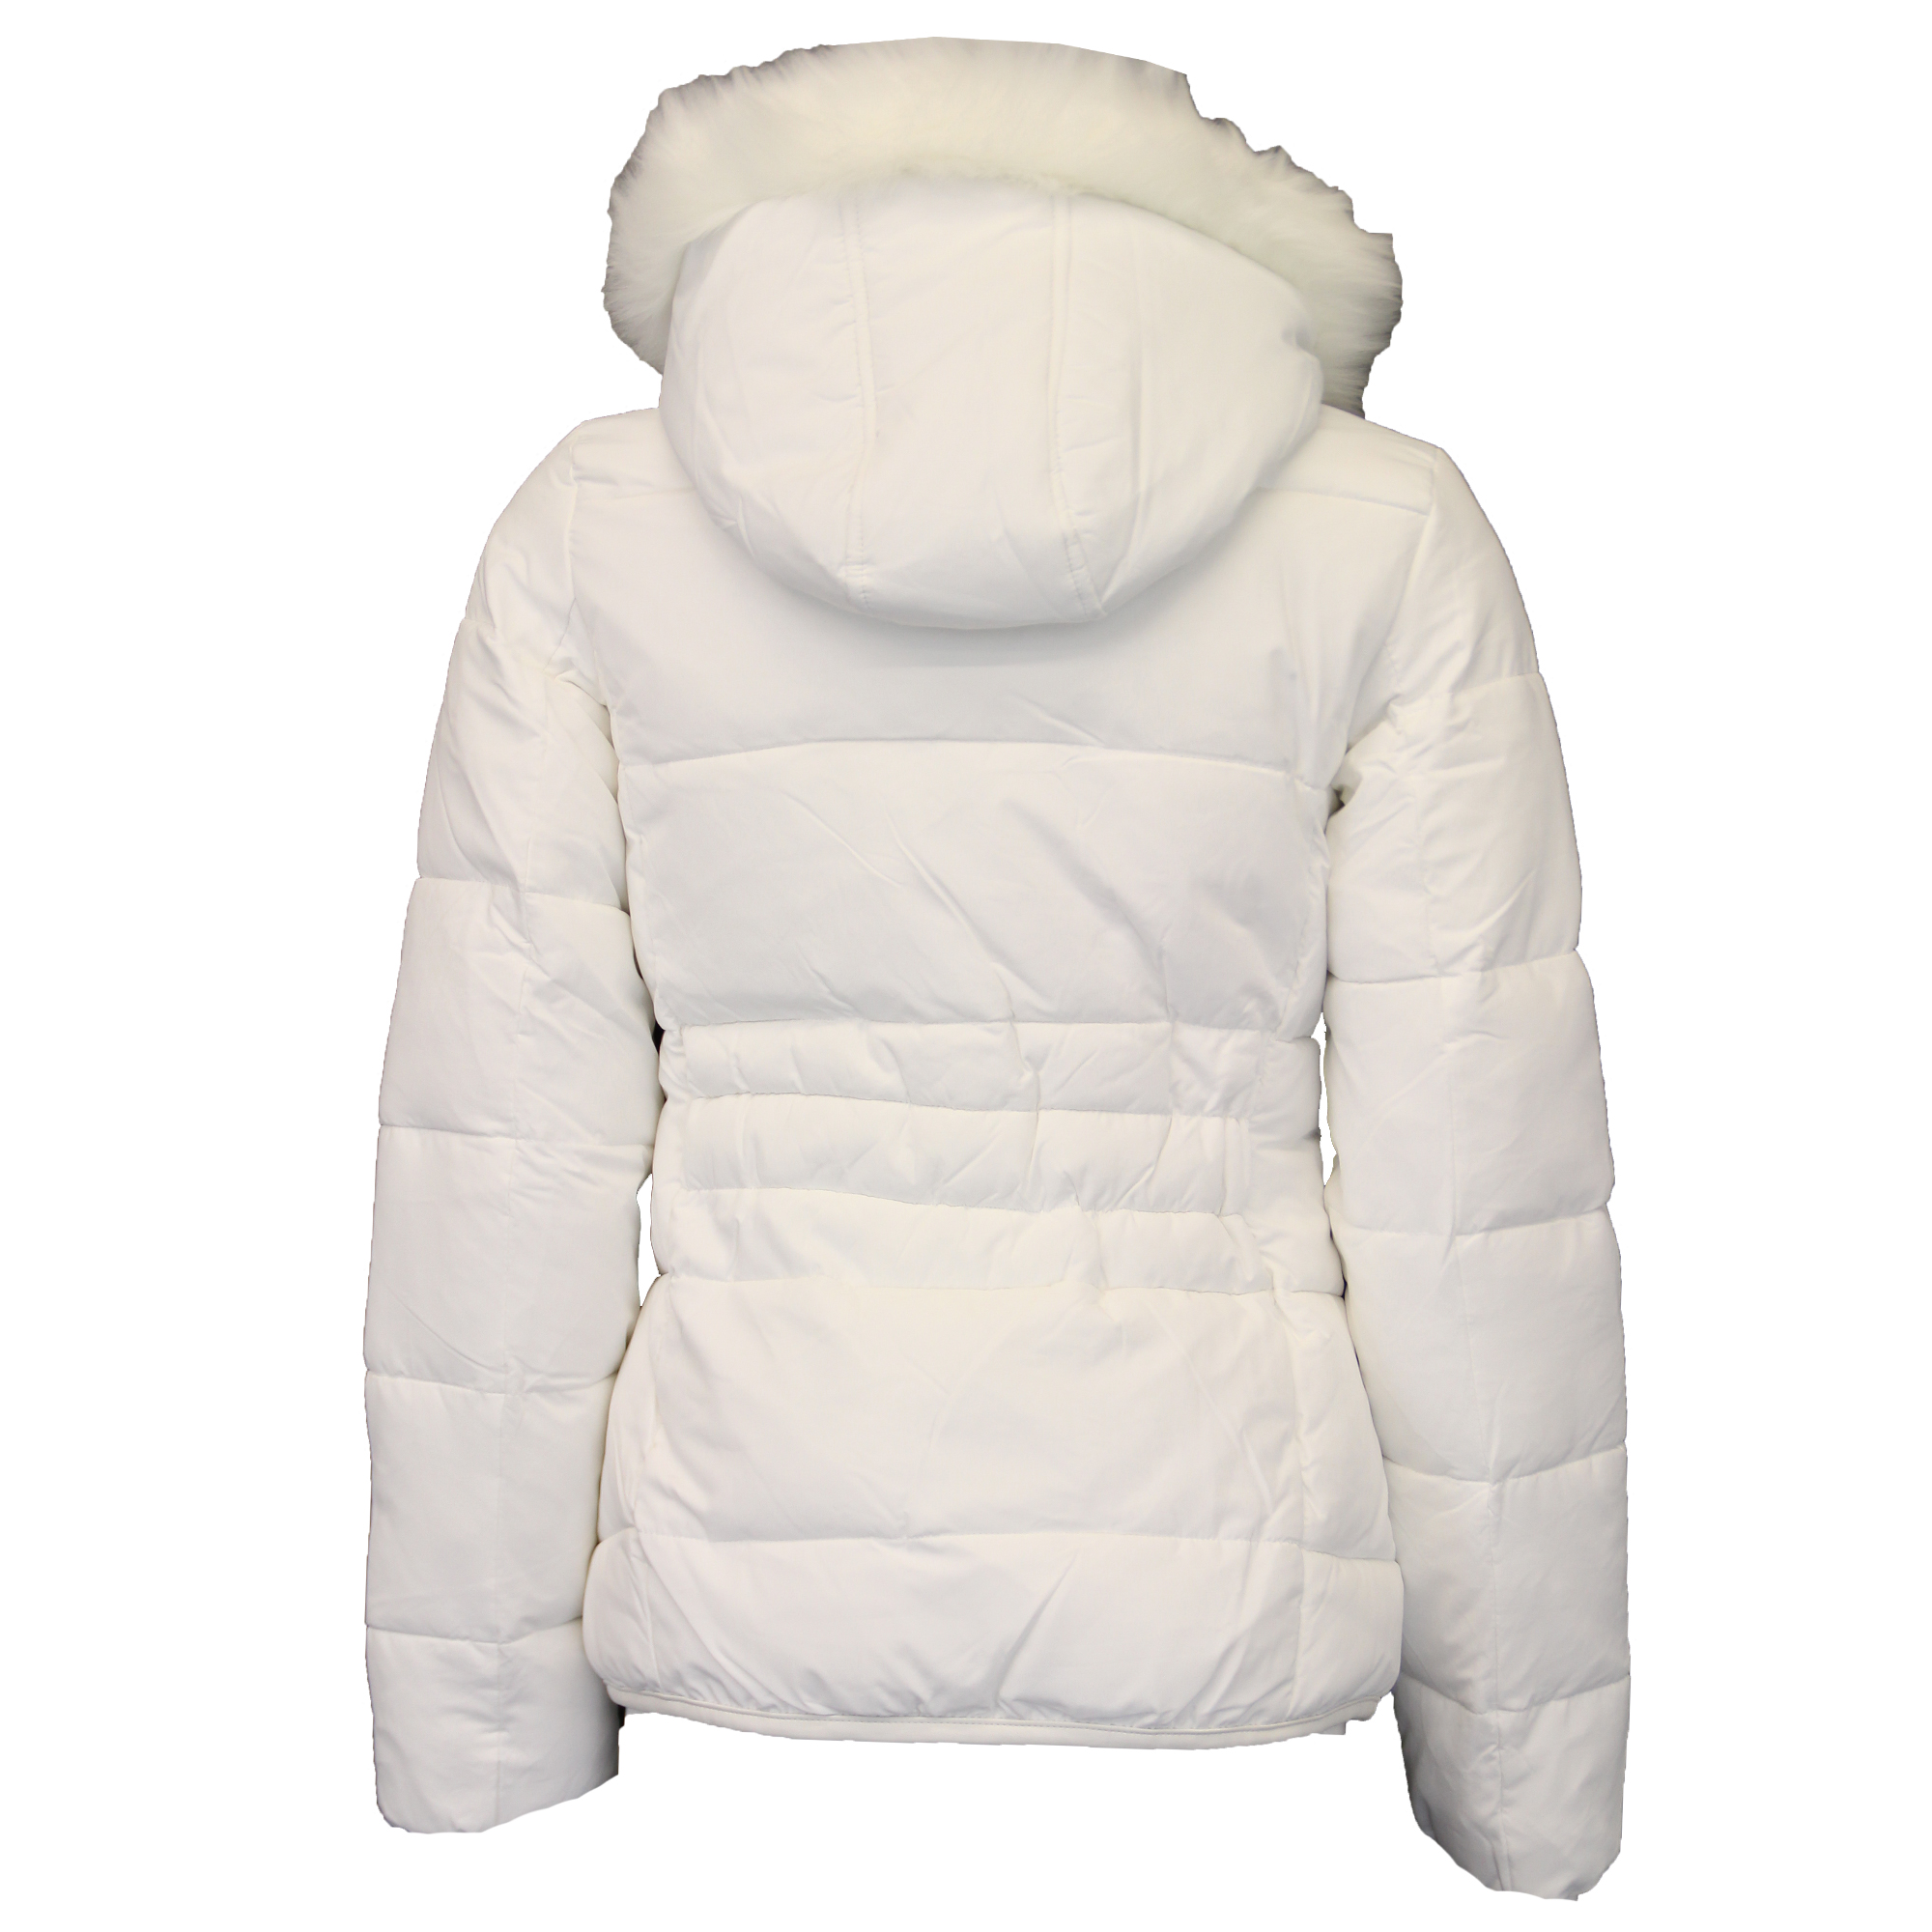 7d1aae30c Details about Ladies Parka Jacket Womens Brave Soul Coat Padded Wadded  Hoodie Fur PVC Winter